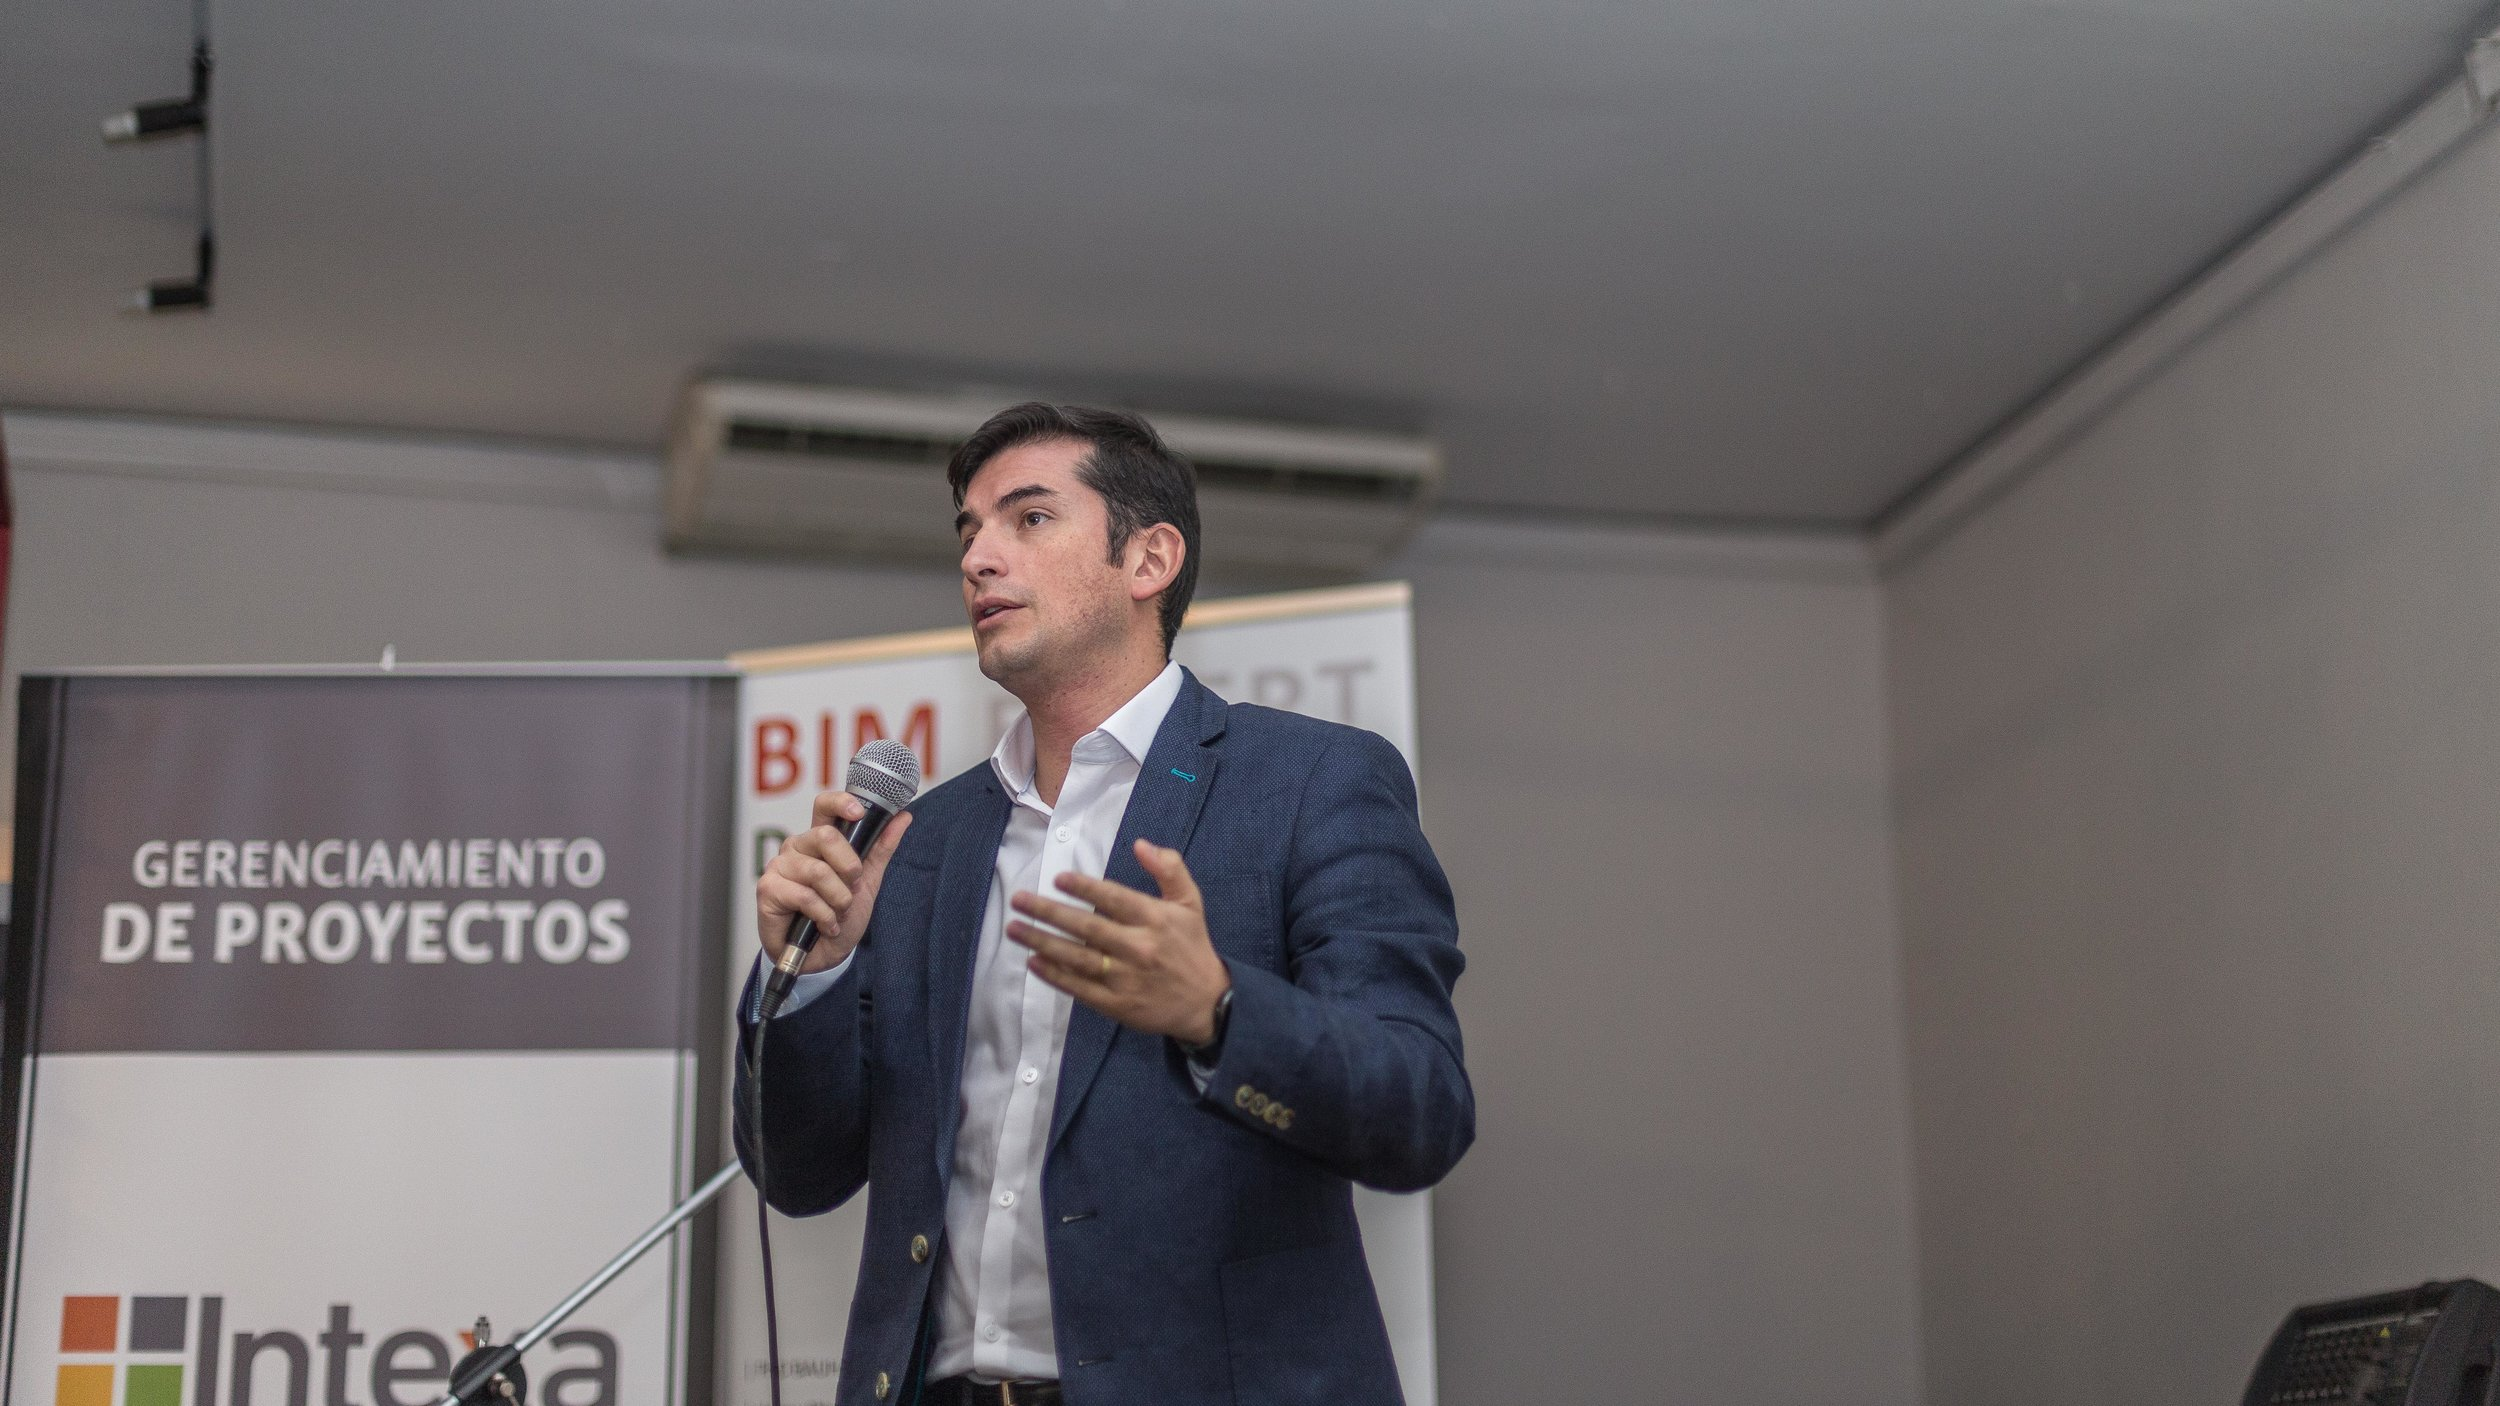 6 Jornada BIM 2019 (61) Daniel Molina.jpg